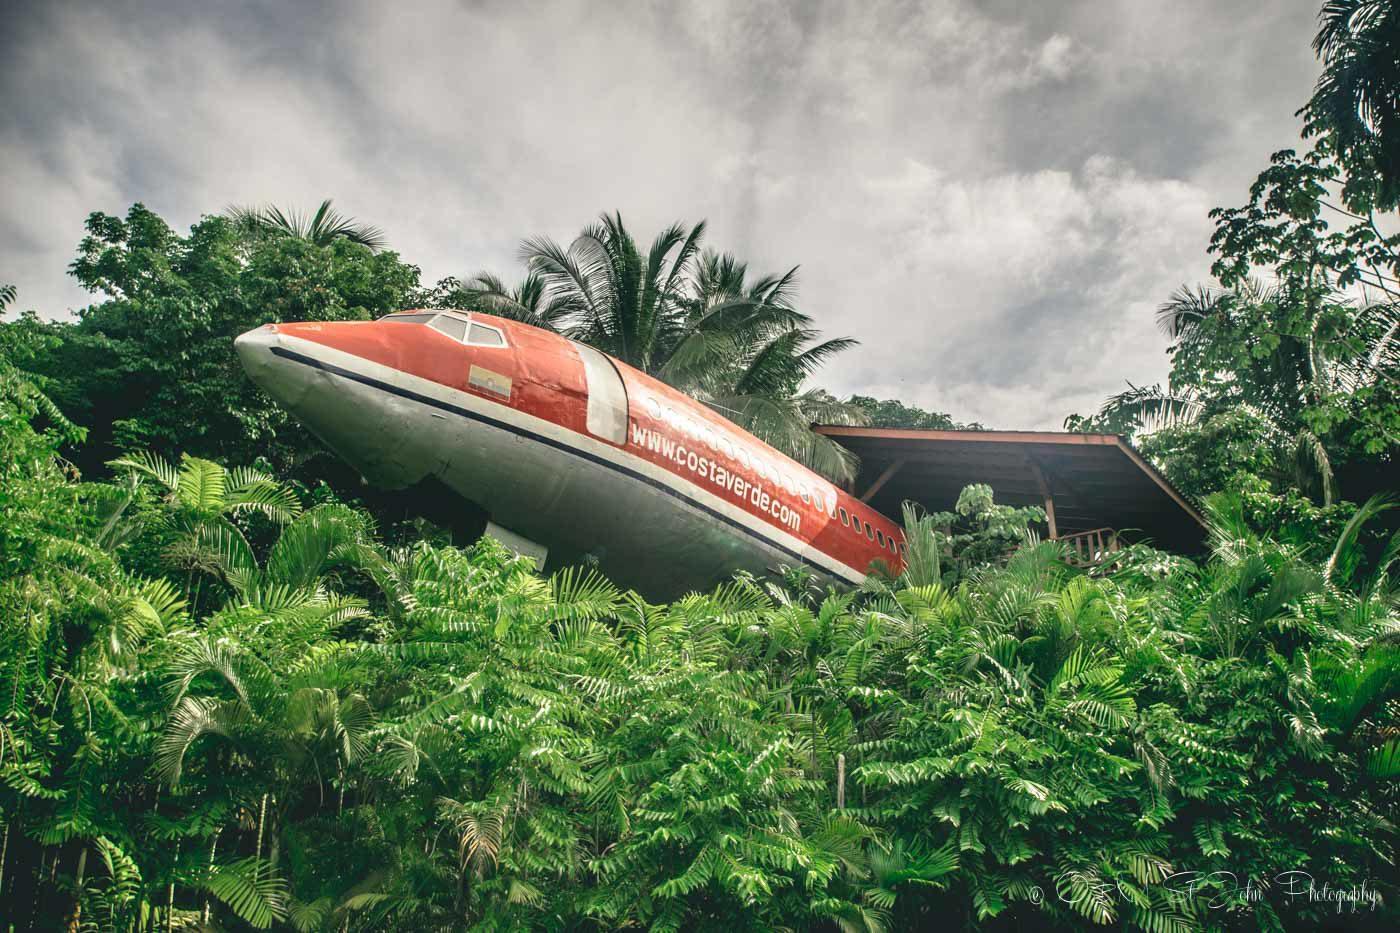 Costa Verde Hotel, 727 Fuselage Home